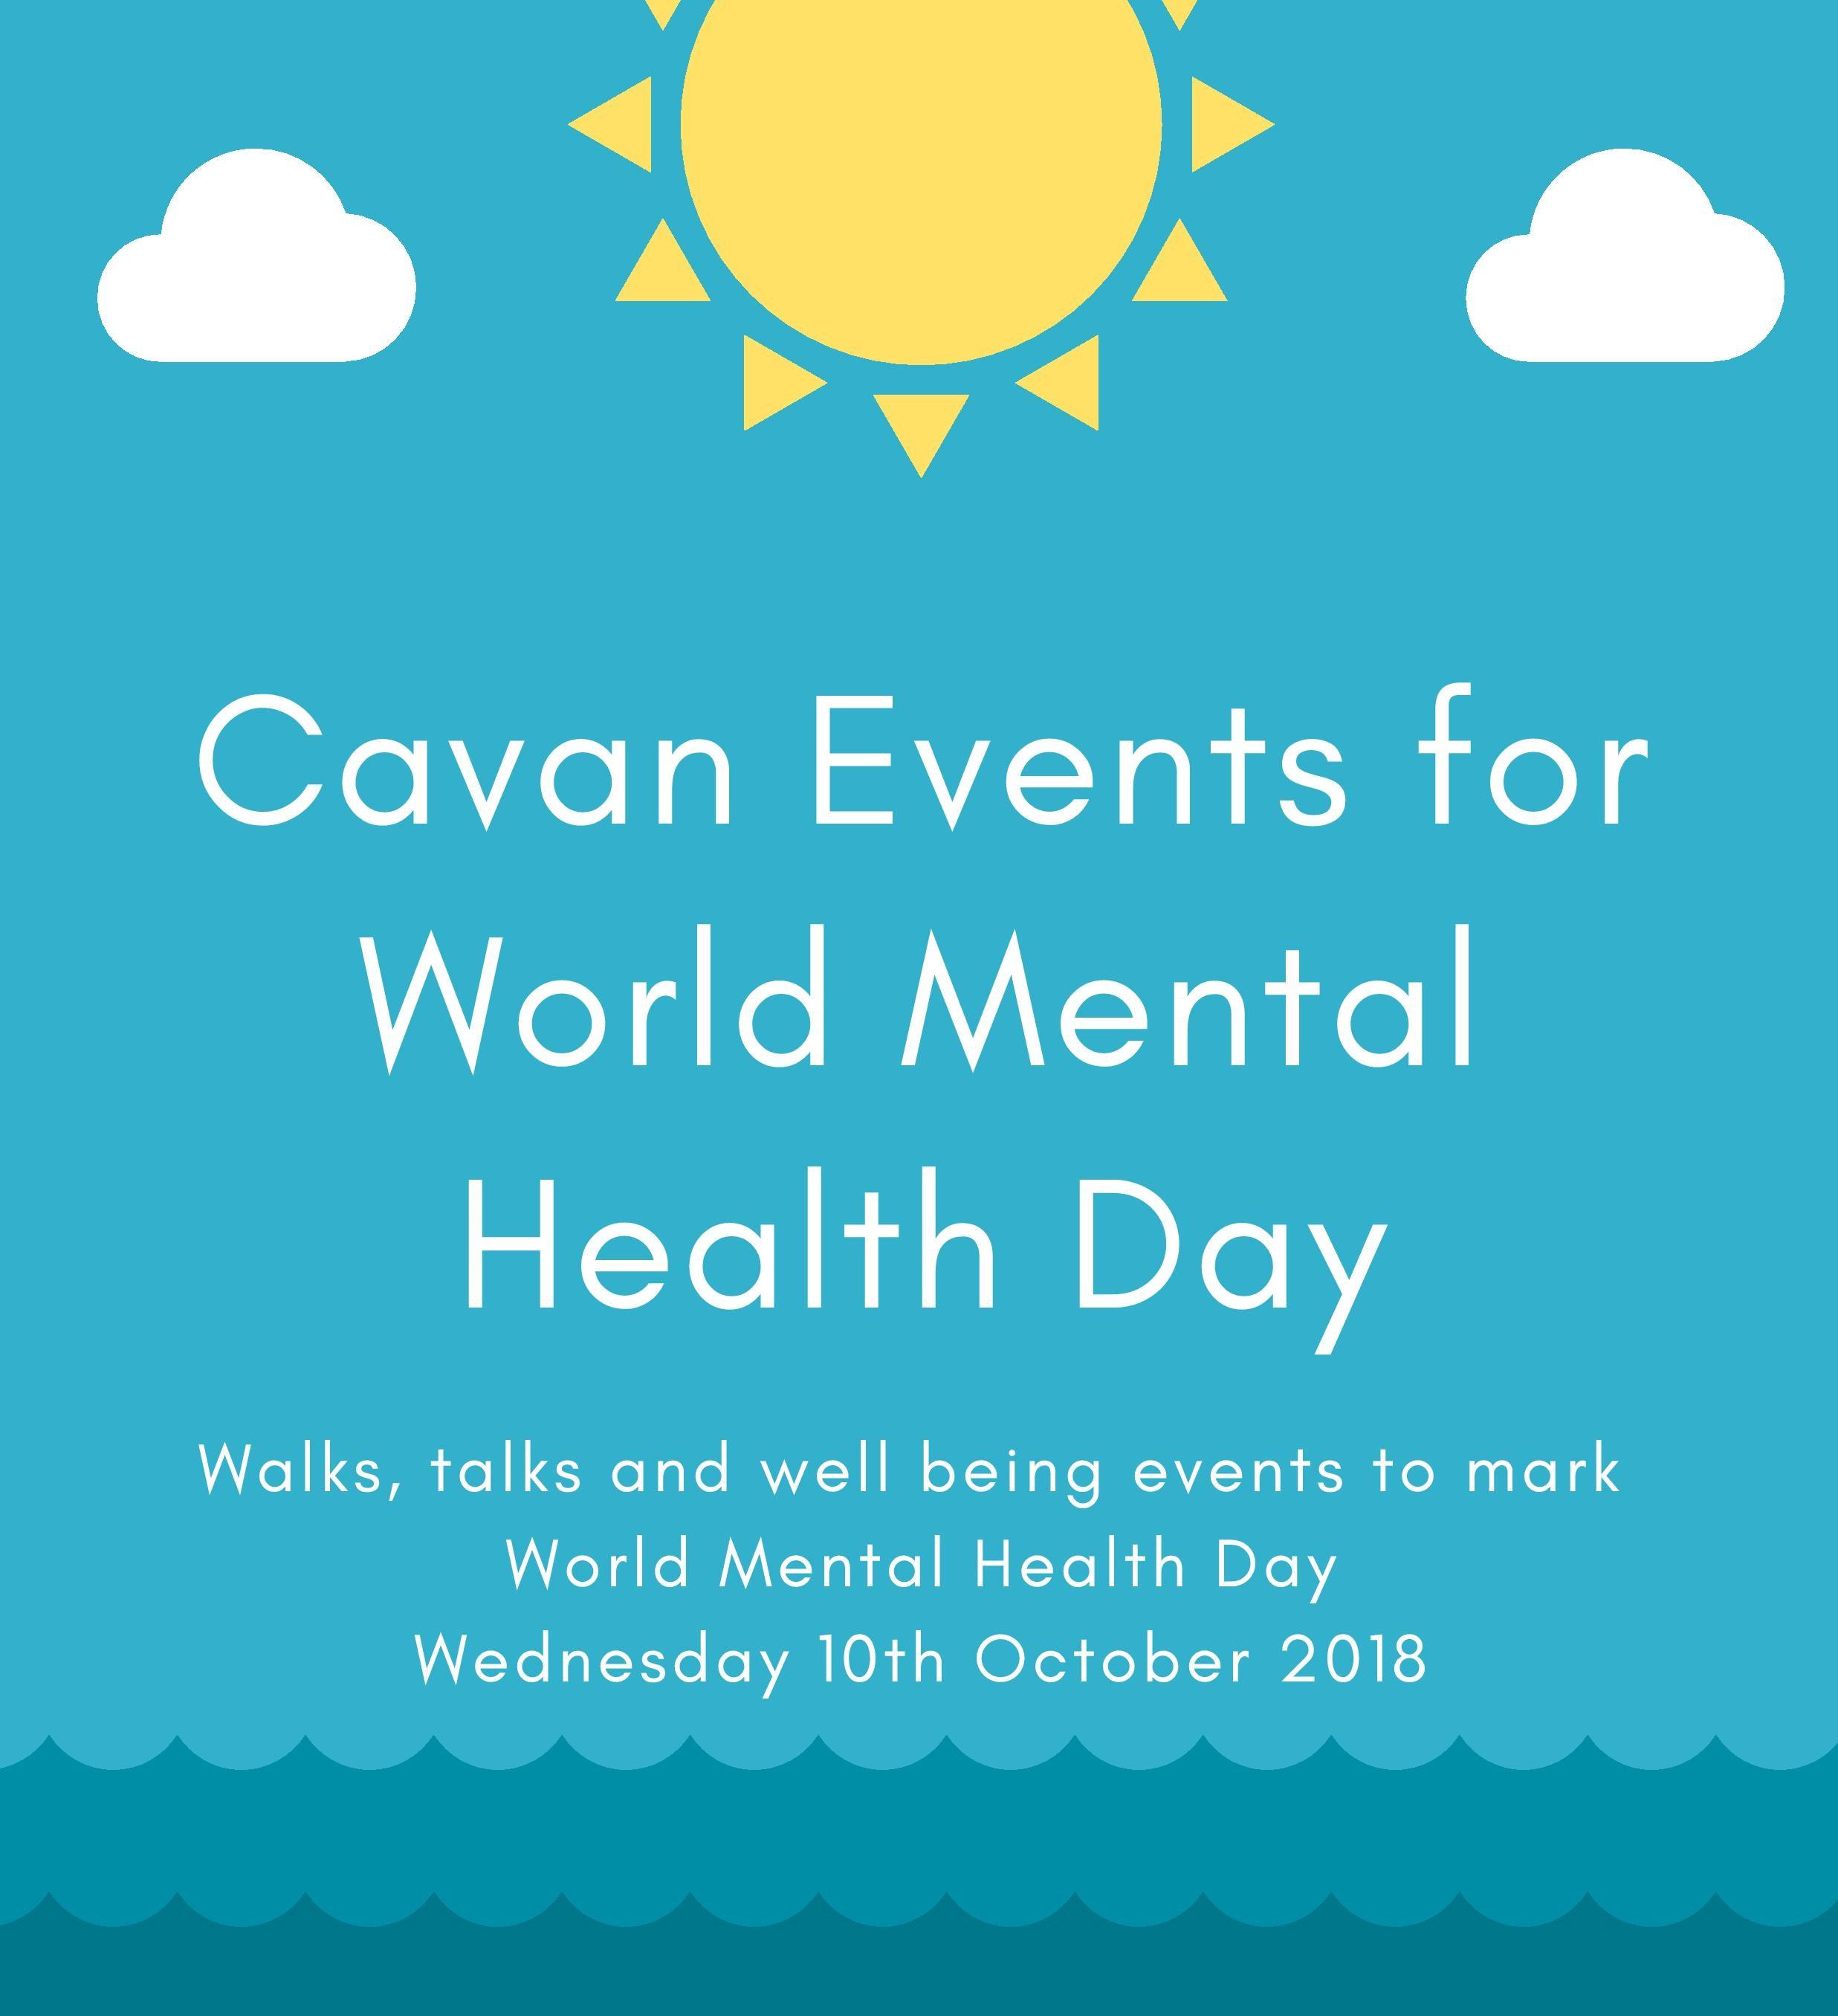 World Mental Health Day – 10th October; events scheduled across Cavan